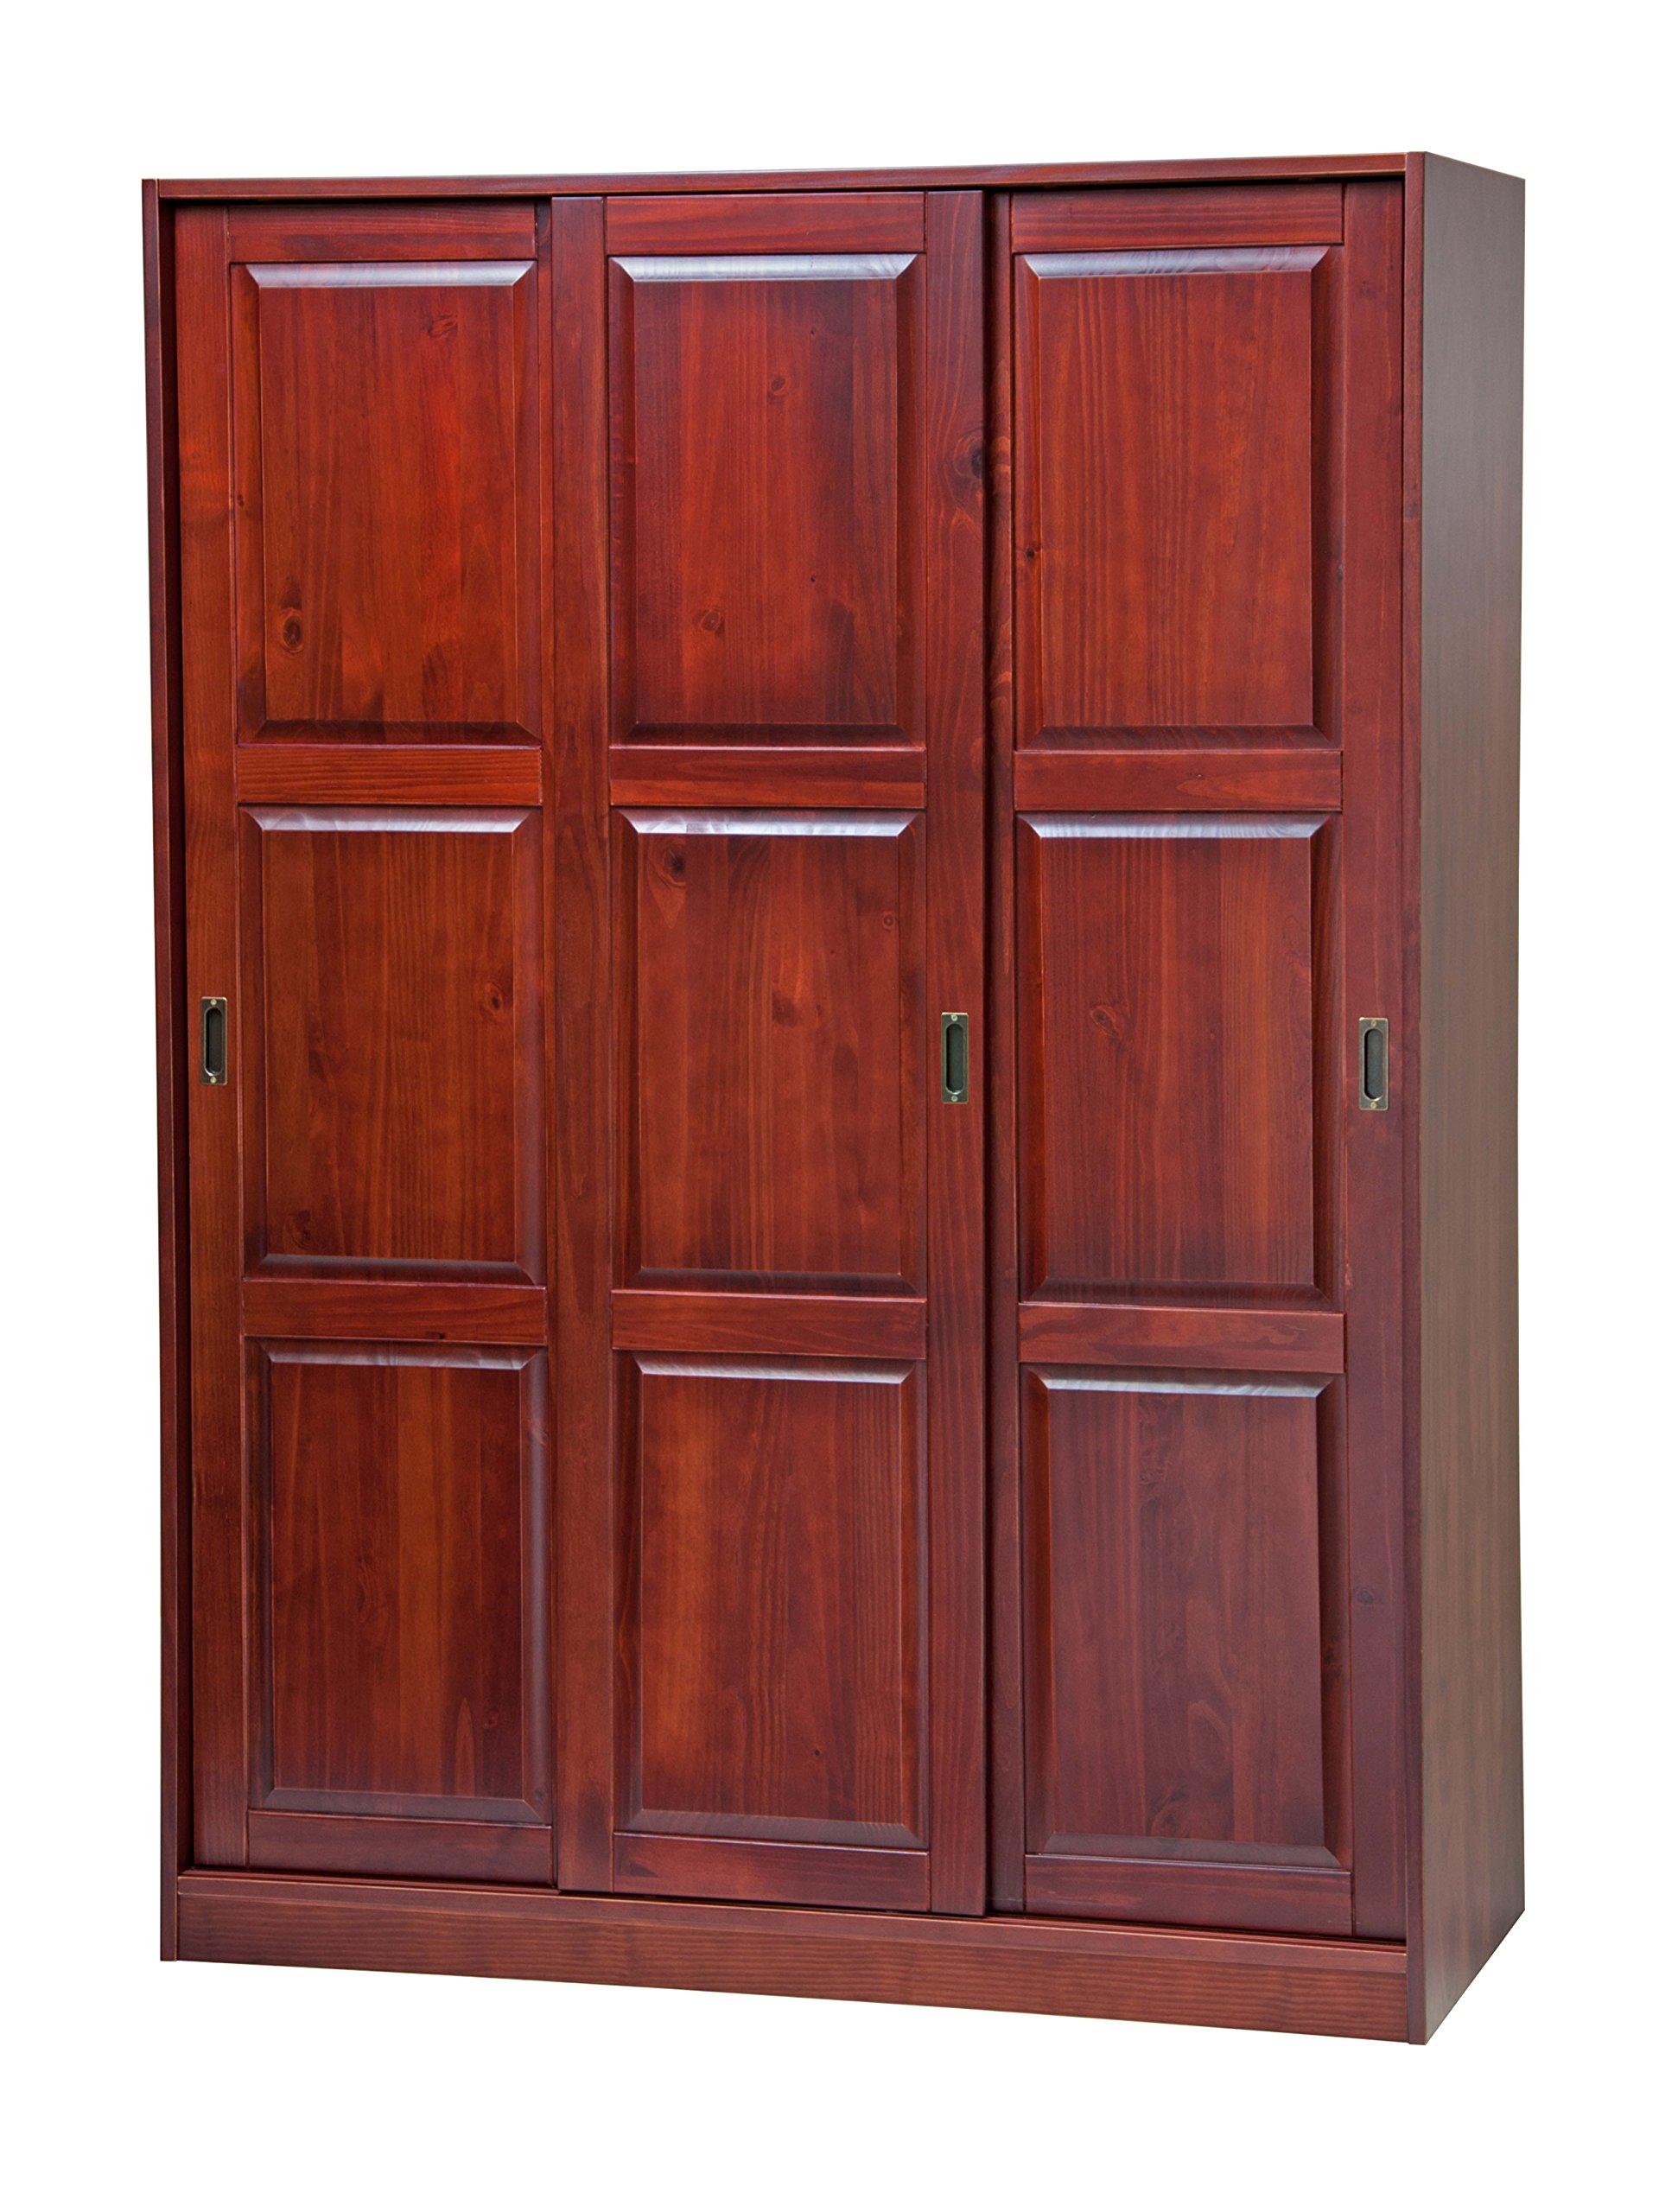 Buy 100 Solid Wood 3 Sliding Door Wardrobe Armoire Closet